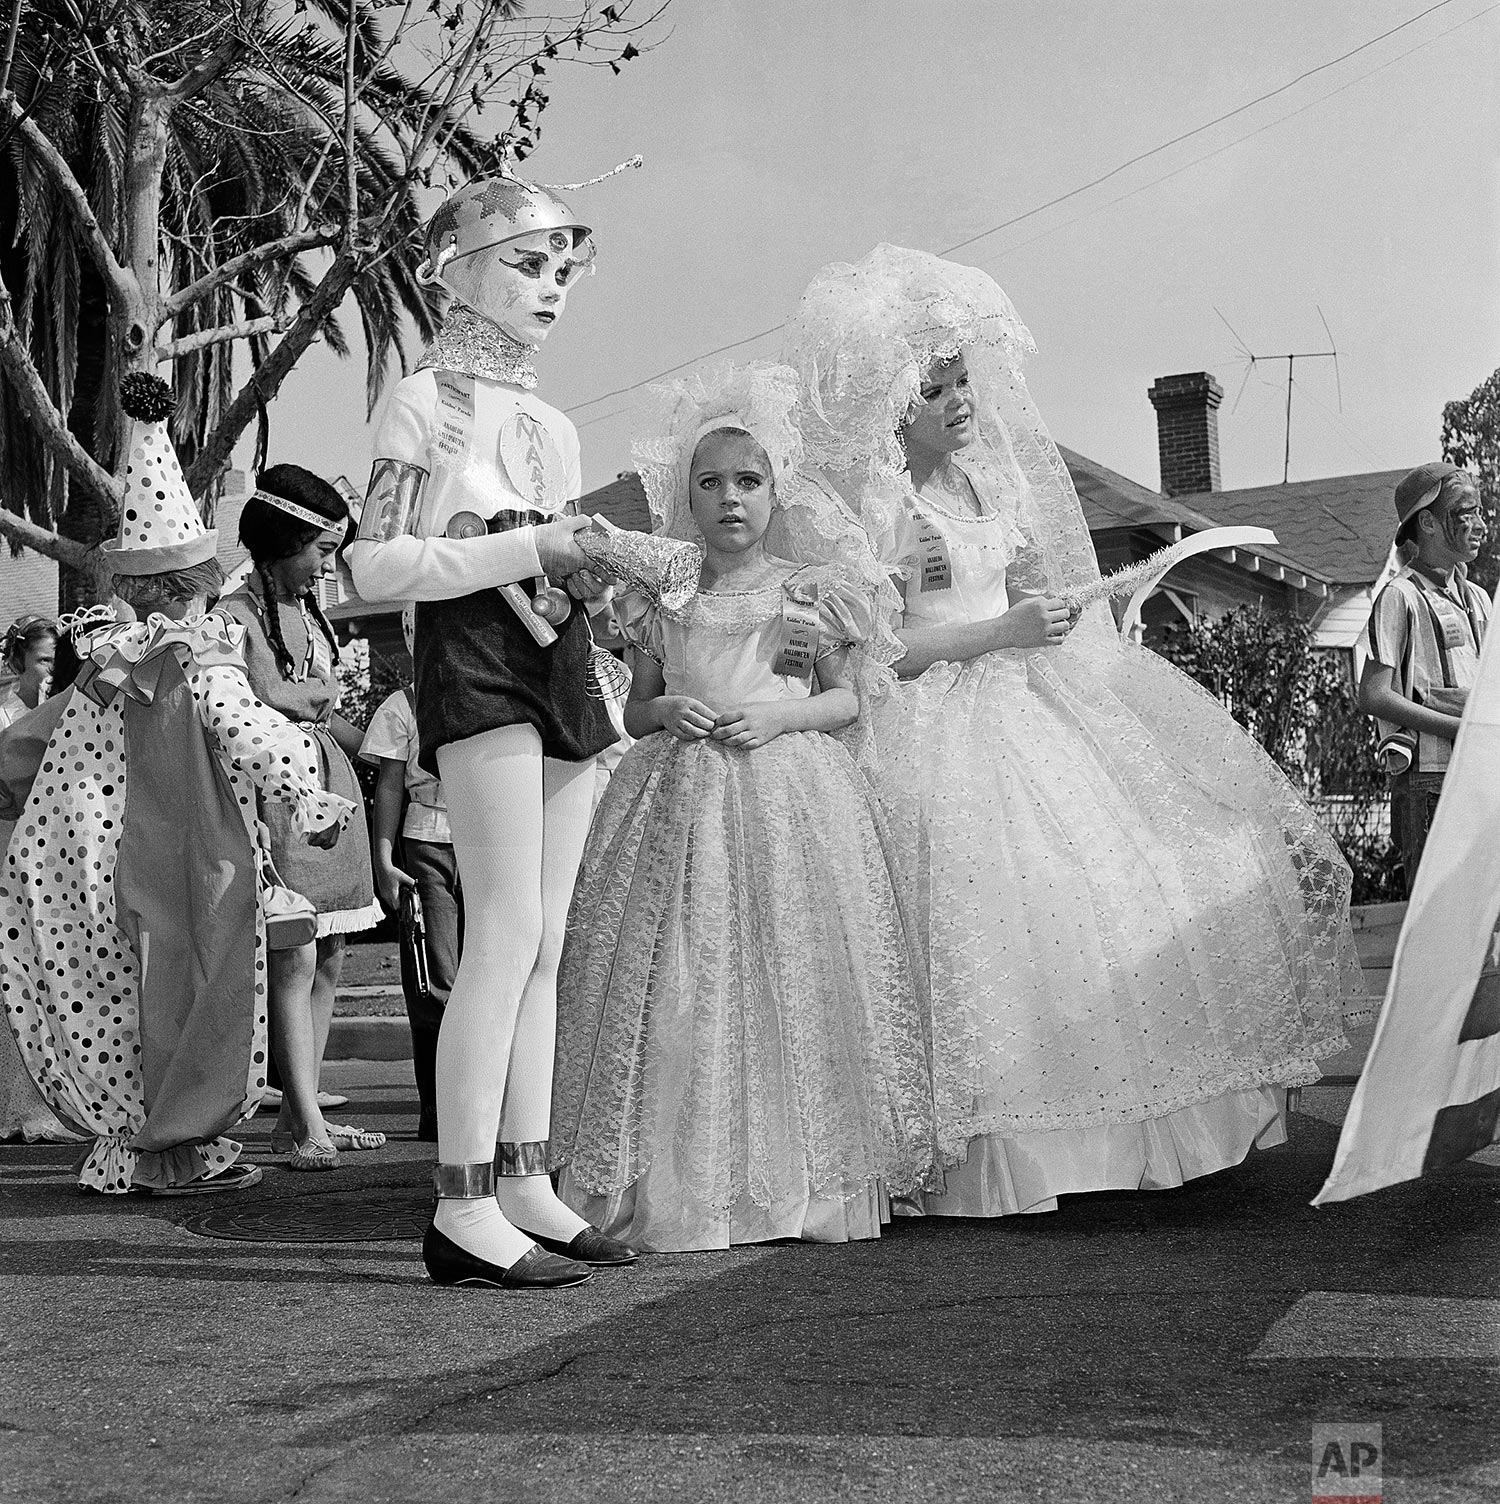 Halloween Parade | Oct. 20, 1962